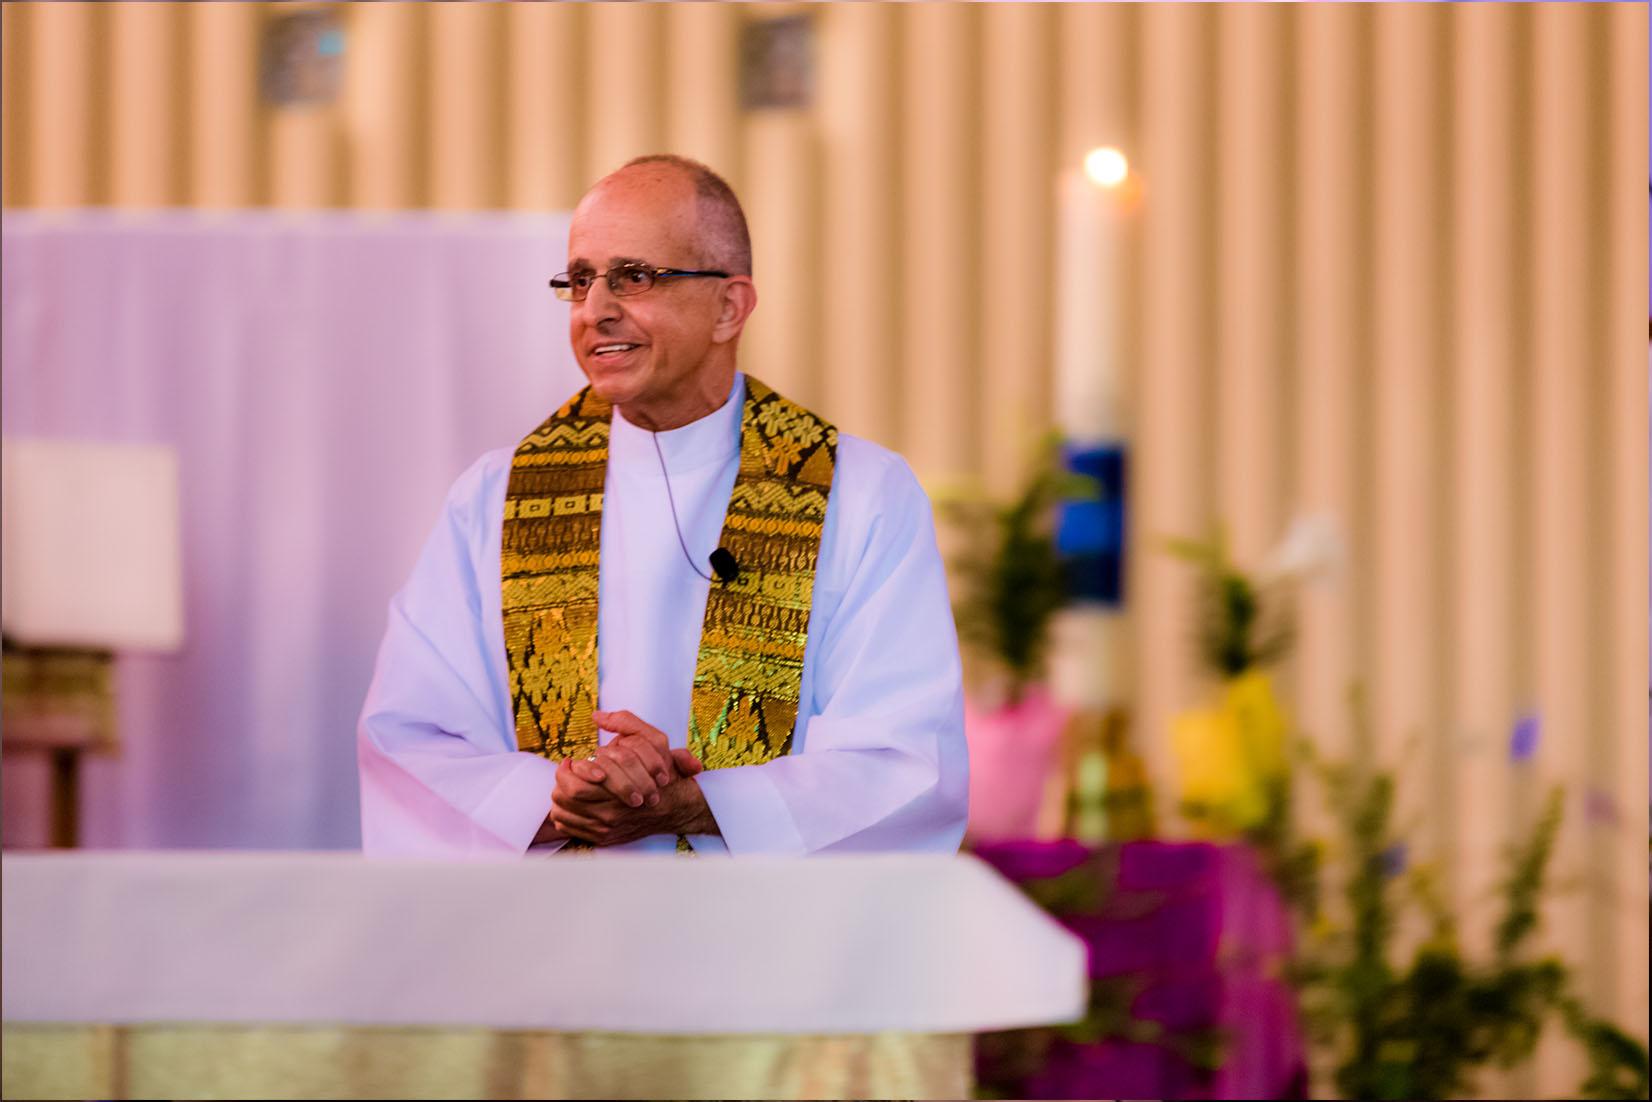 Father Salvatore Ragusa holding mass